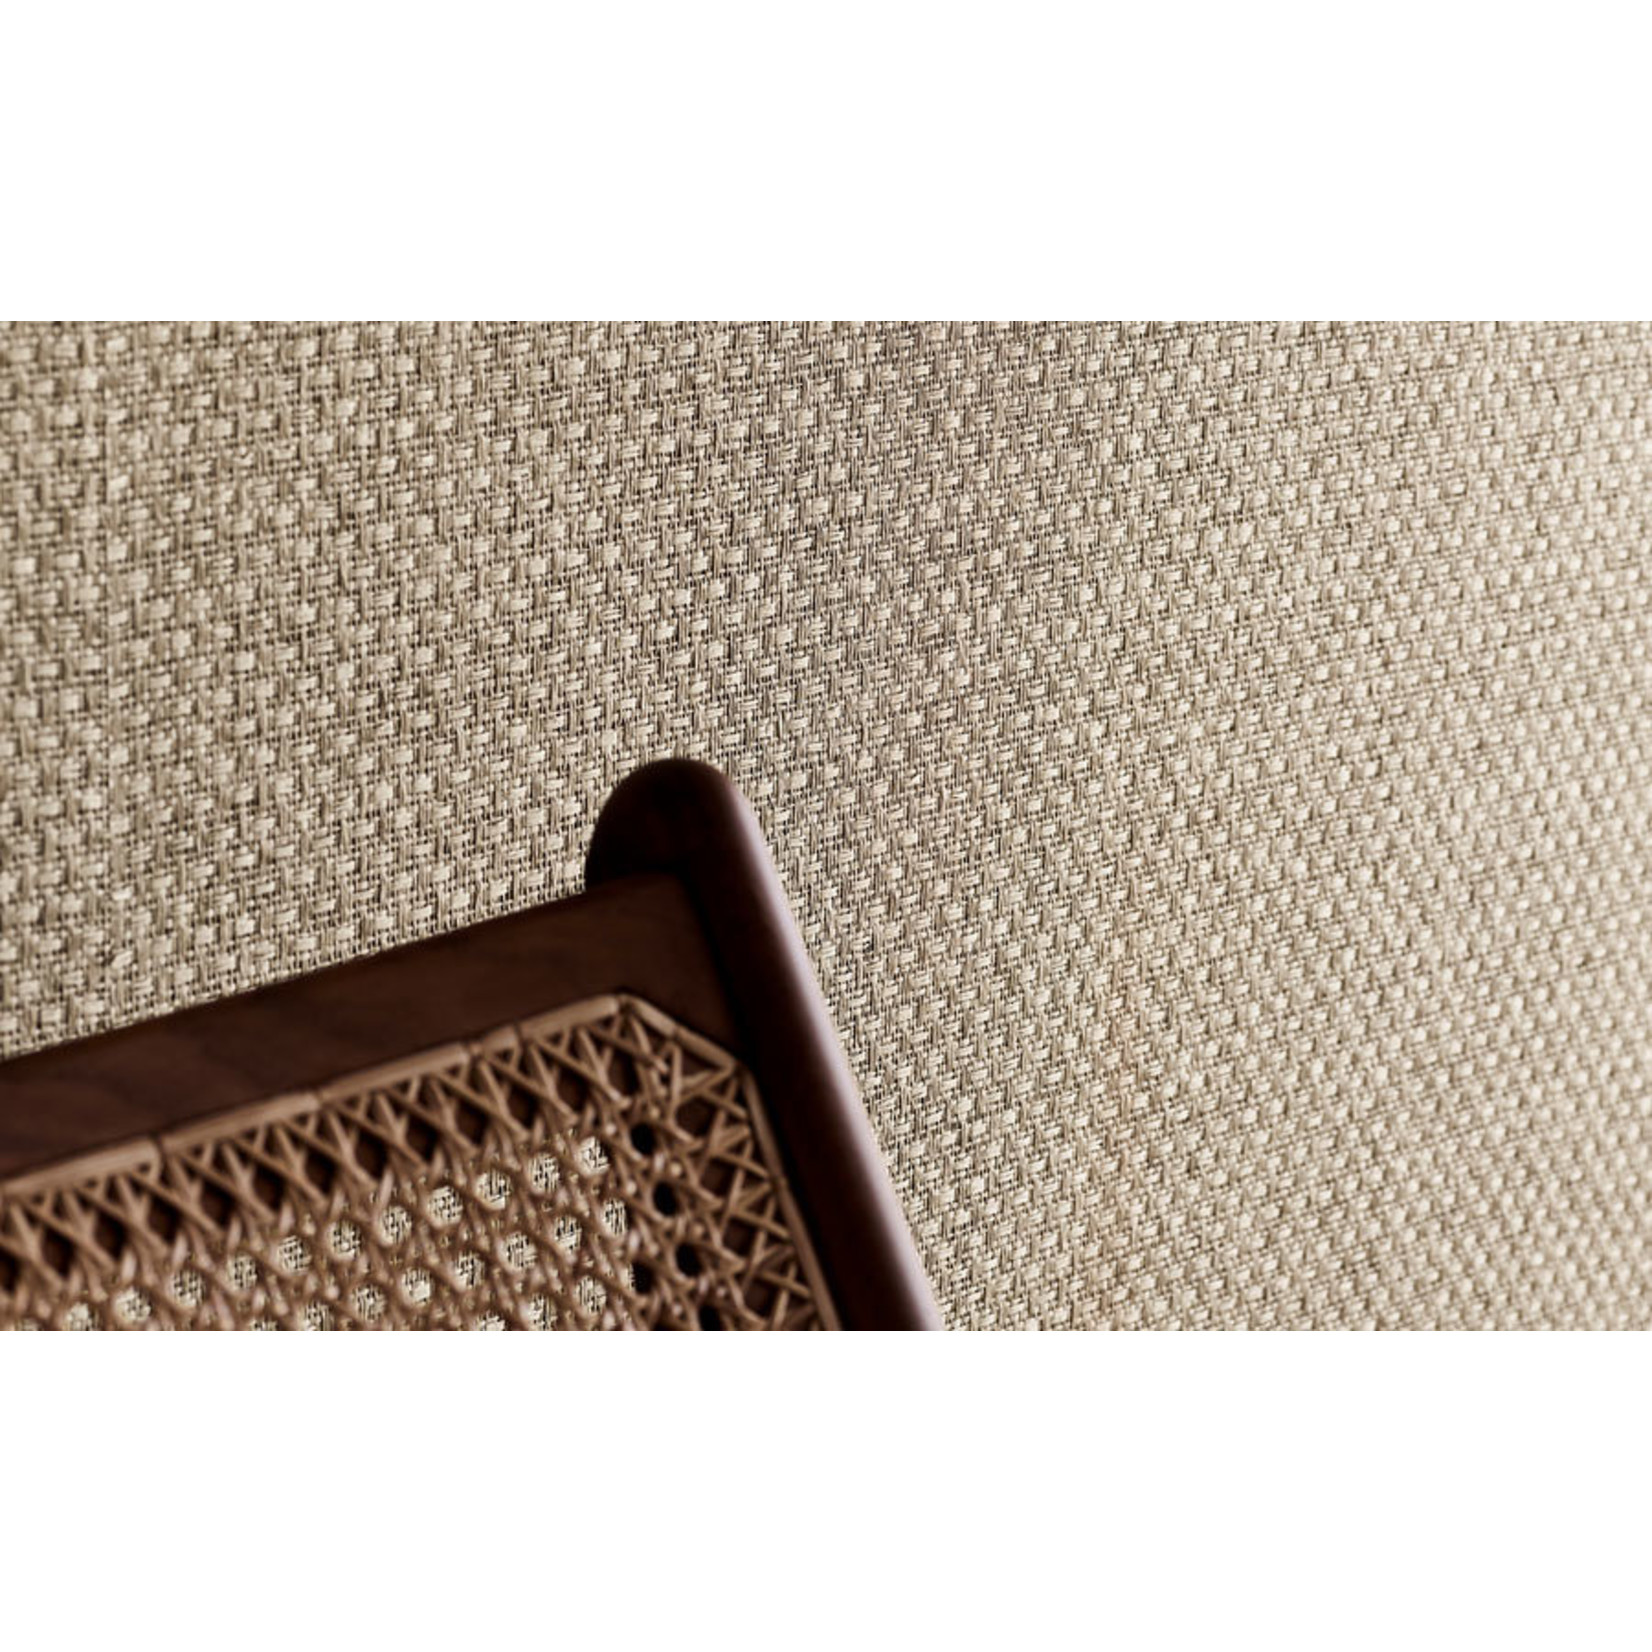 Mark Alexander Paperweave Handwoven Wallcoverings | Shifu Jasmine